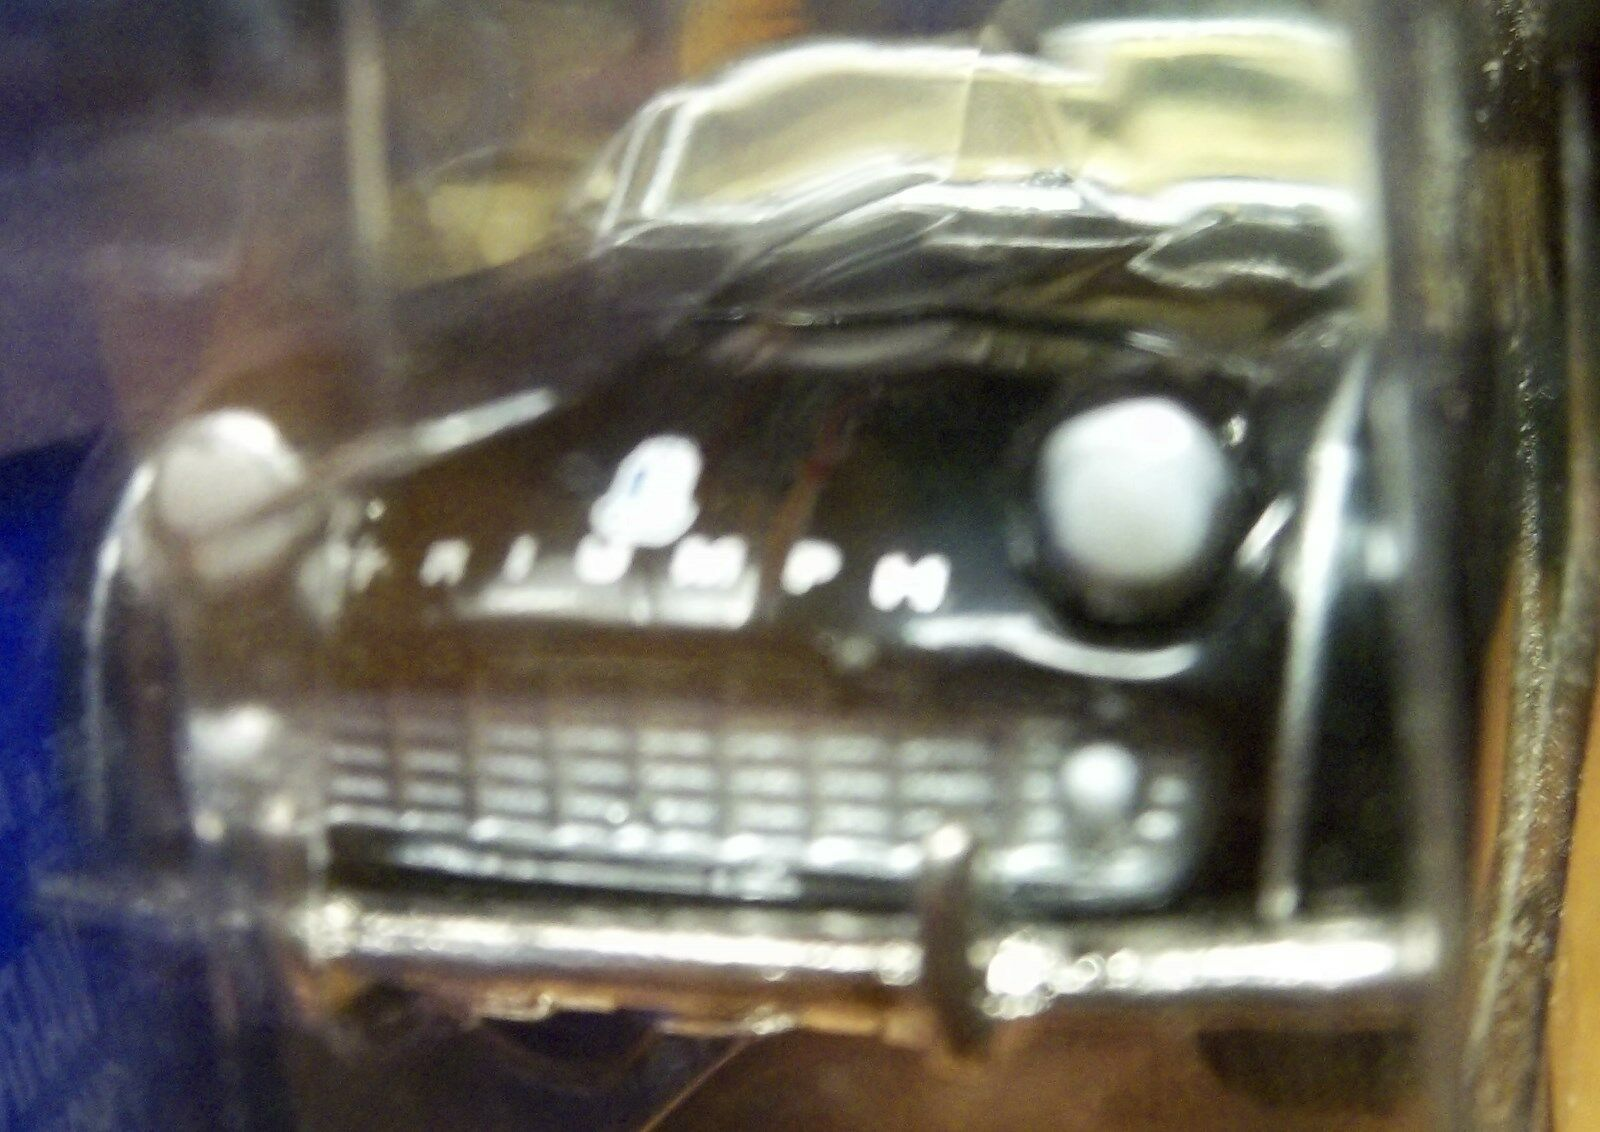 mas barato 1960 1960 1960 TRIUMPH TR3A Negro + Bronceado blanco Lightning TRIUMPH TR3 WIDEMOUTH Raro TR3  más vendido